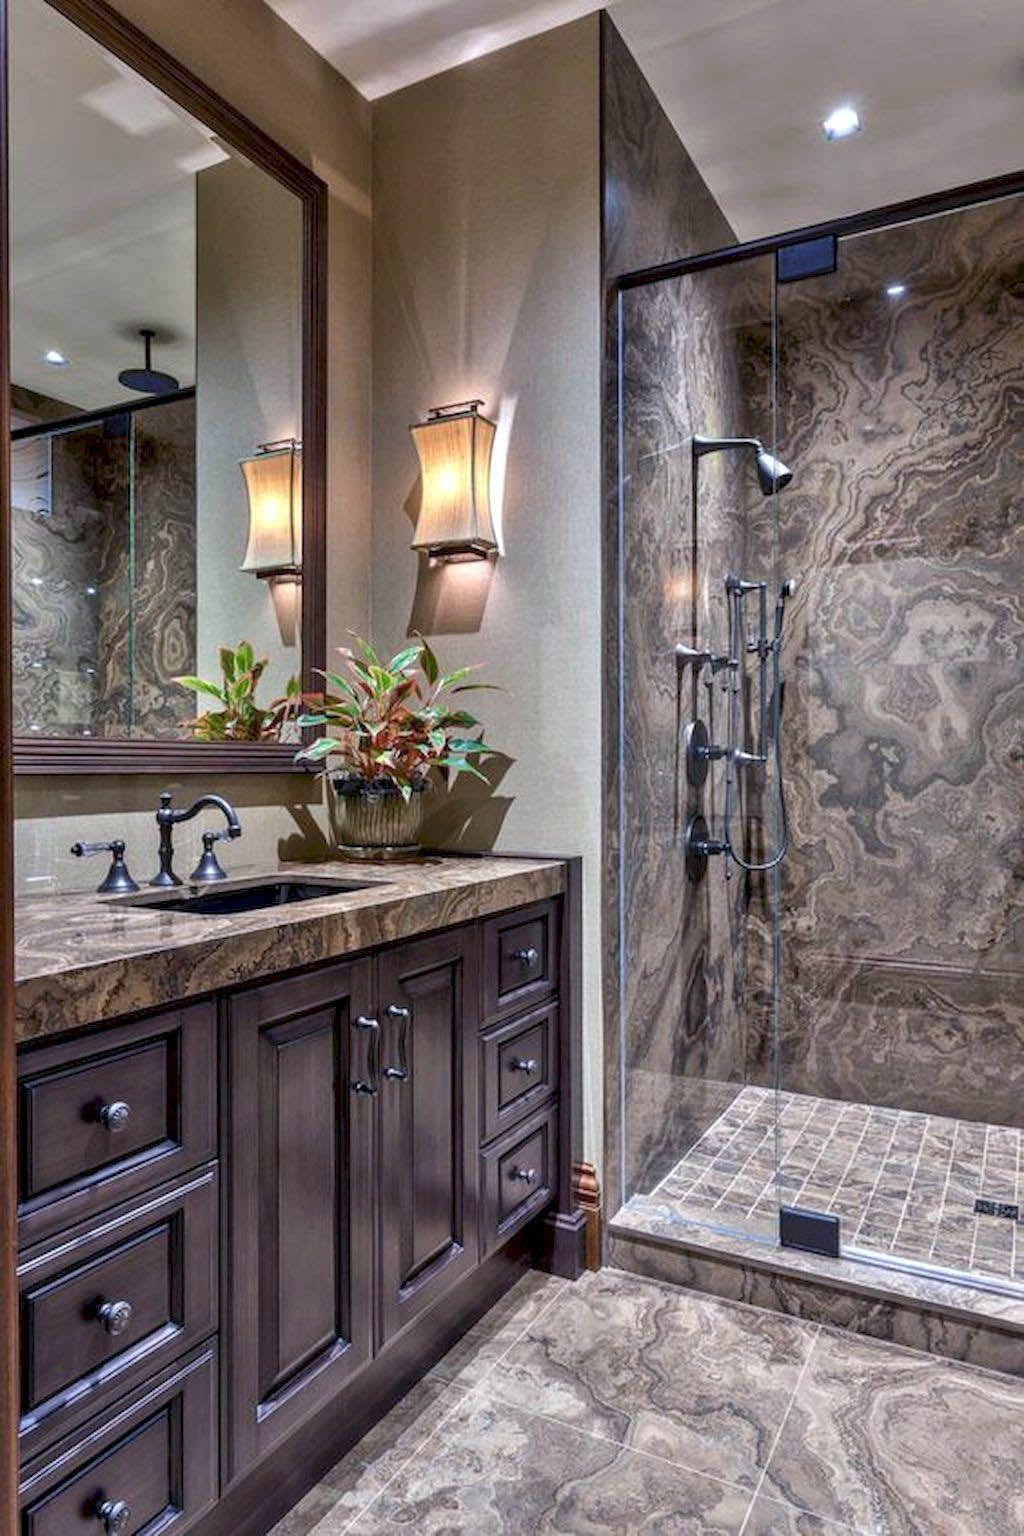 Cute Small Master Bathroom Ideas Shower Only For 2019 Rustic Bathroom Remodel Rustic Bathroom Designs Rustic Bathrooms